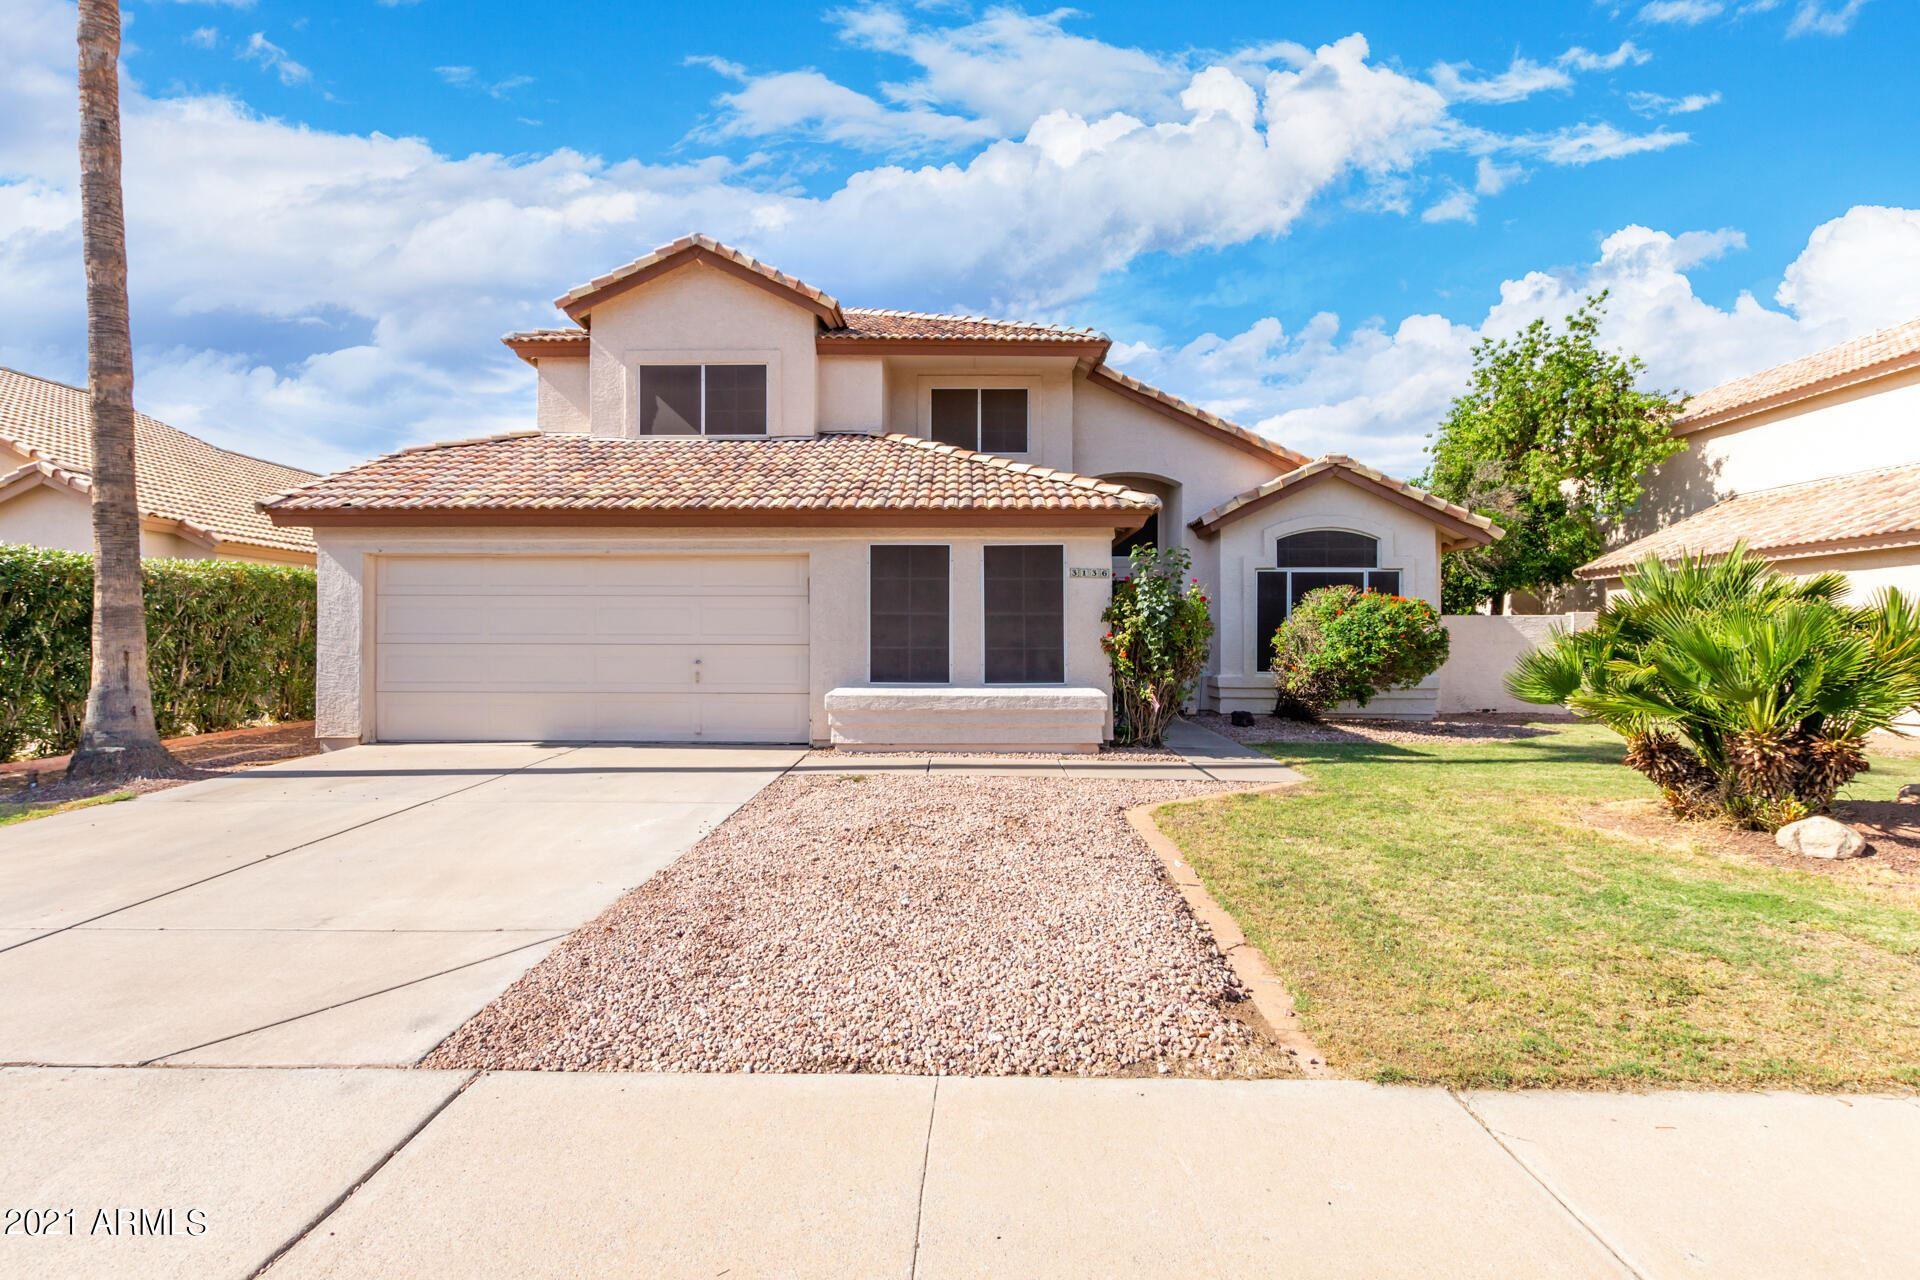 Photo of 3136 N IVORY Lane, Avondale, AZ 85392 (MLS # 6305806)